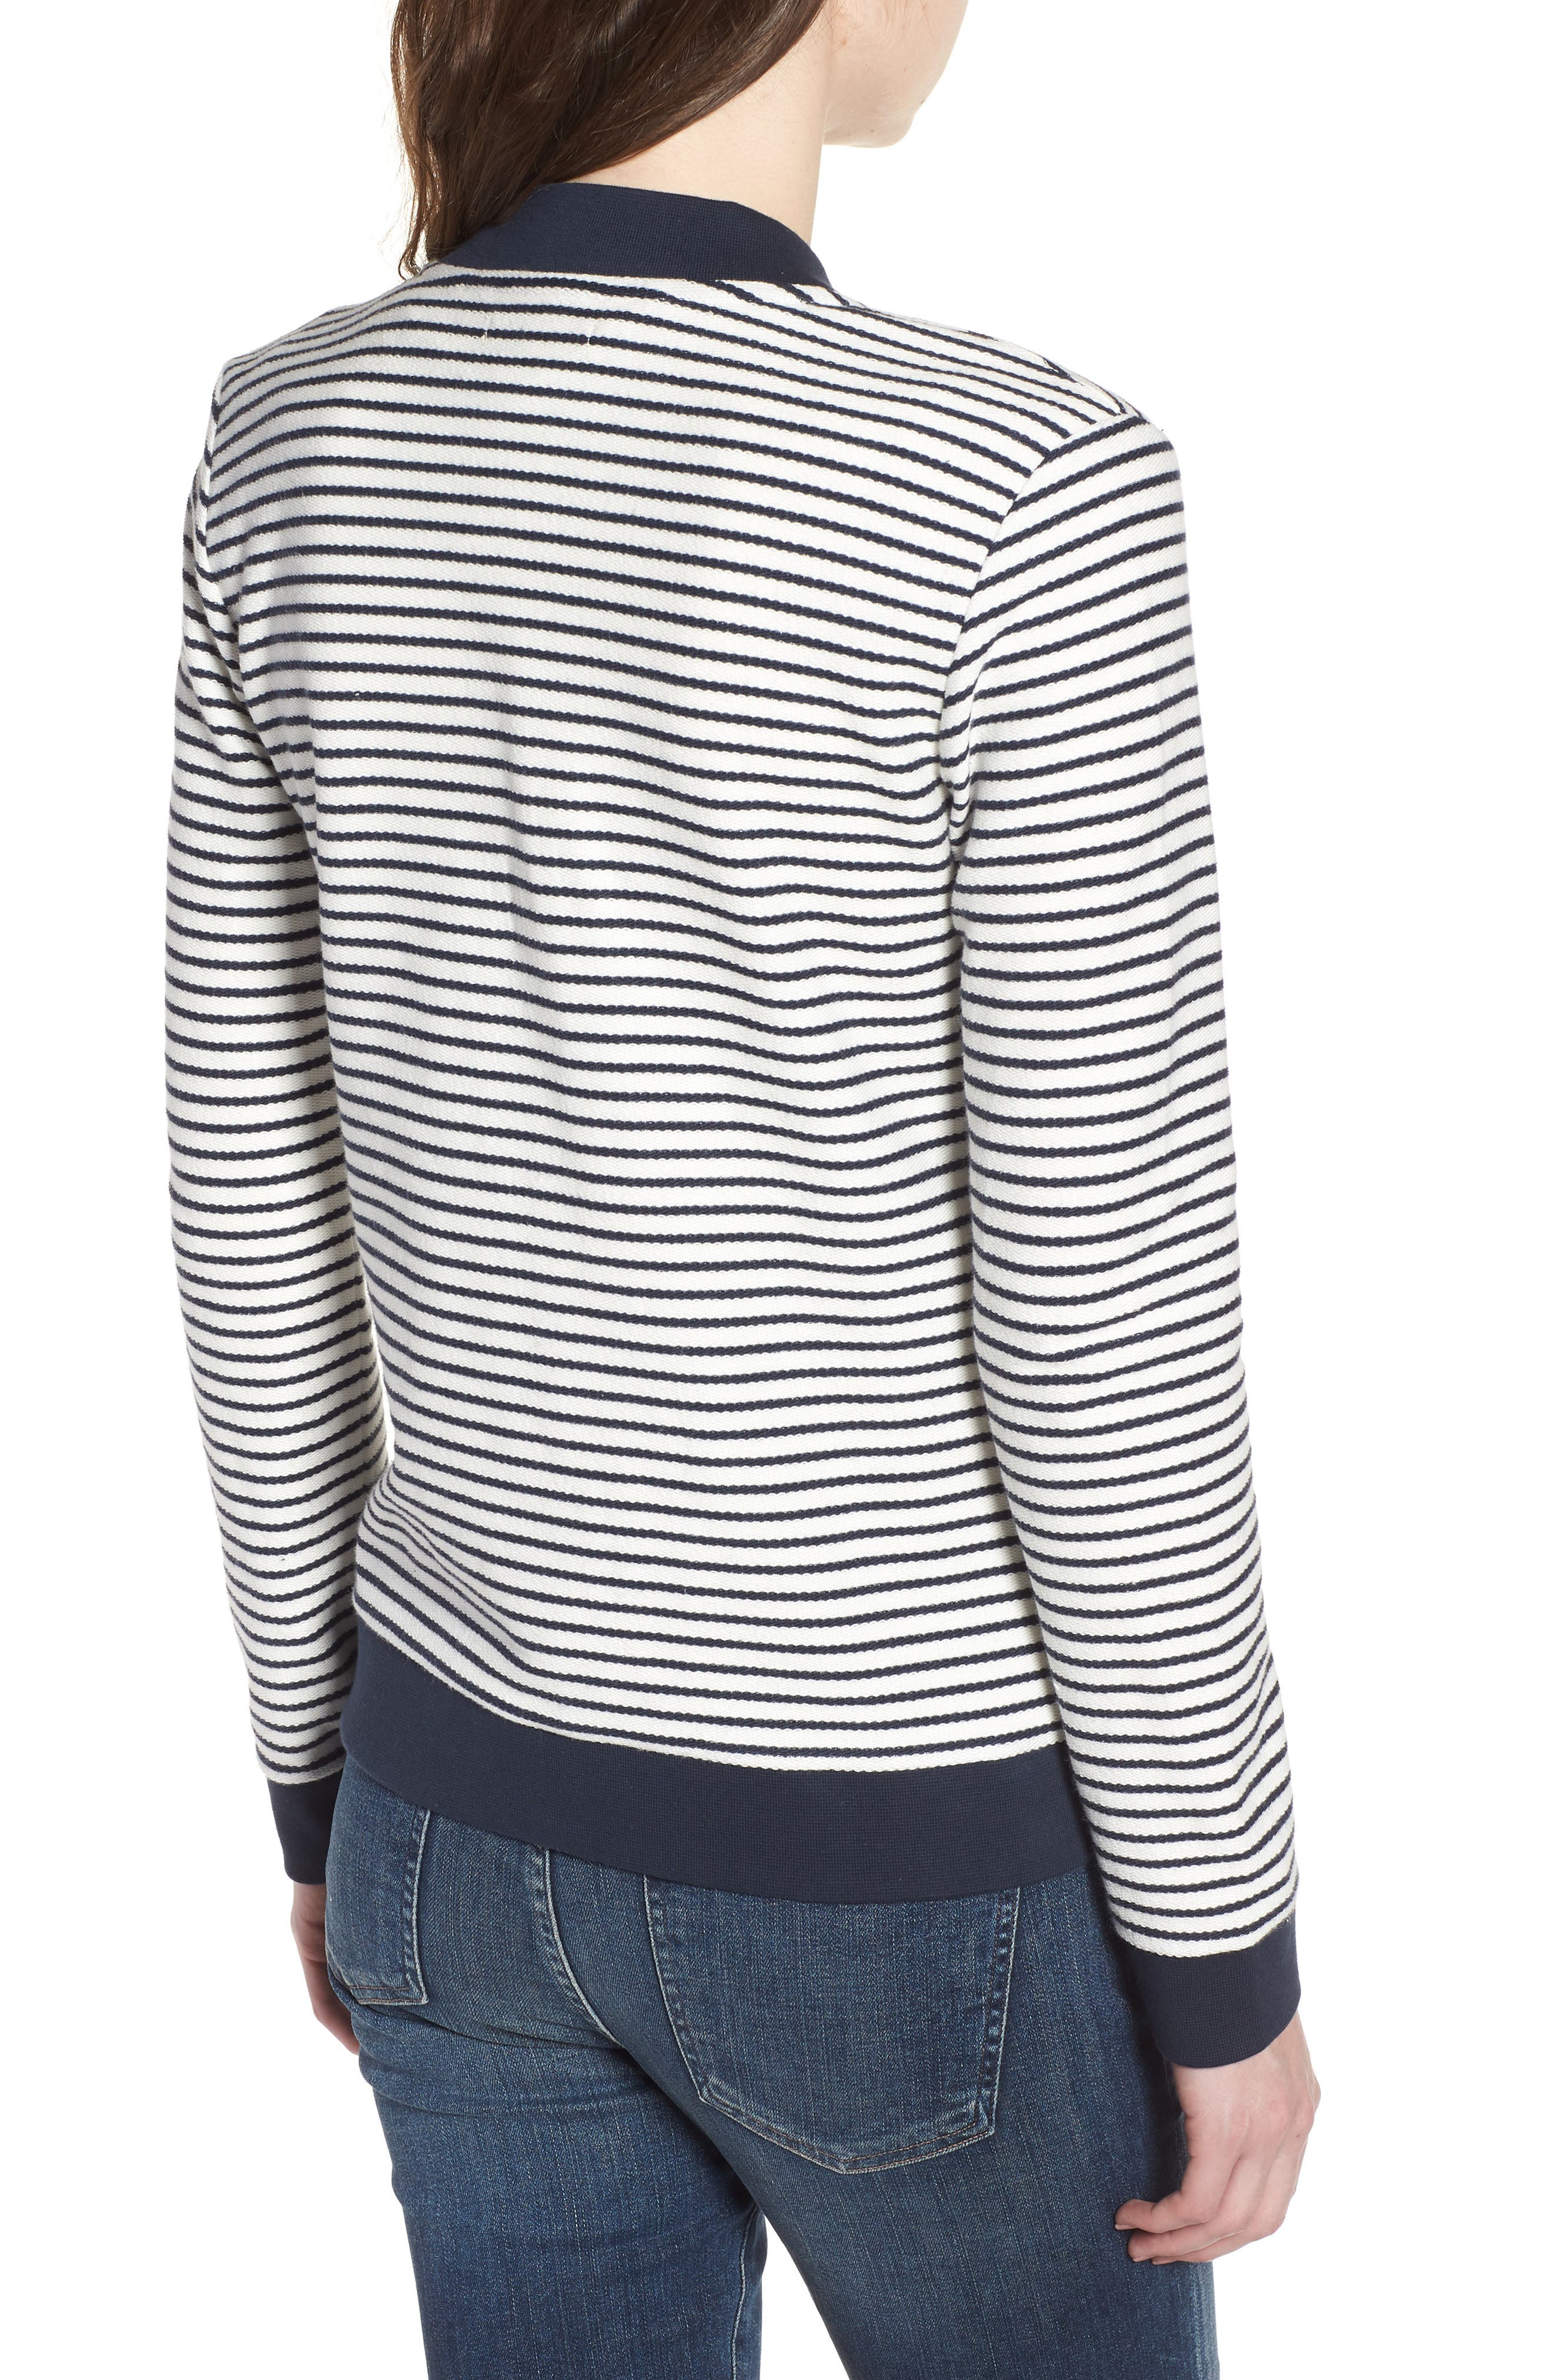 Bamburgh Sweater Jacket,                             Alternate thumbnail 4, color,